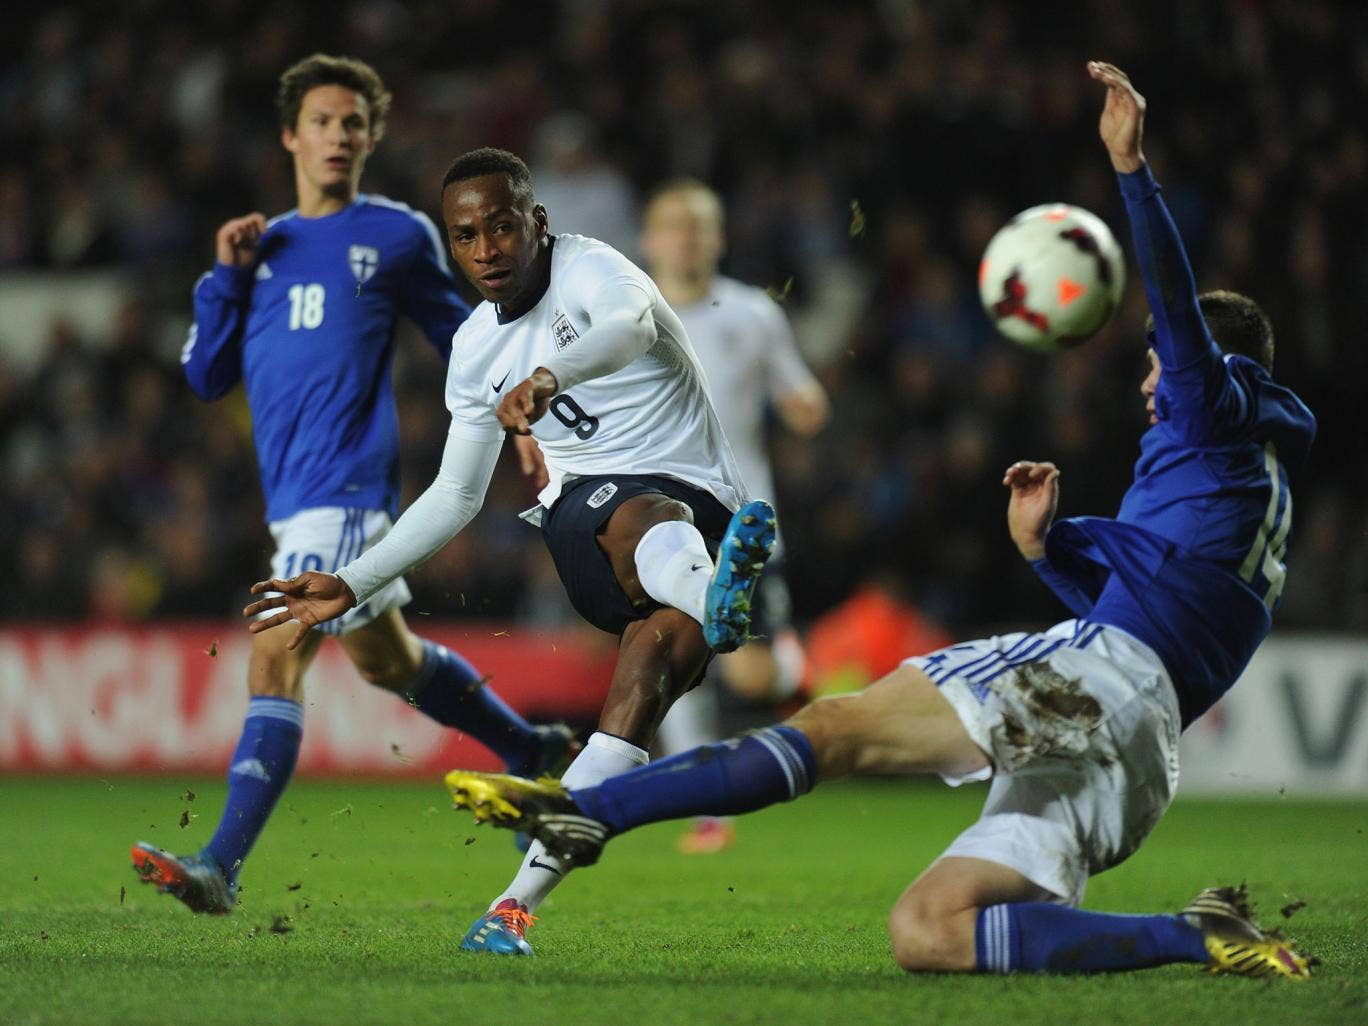 England Under-21 striker Saido Berahino fires past Daniel O'Shaunessy of Finland Under-21s